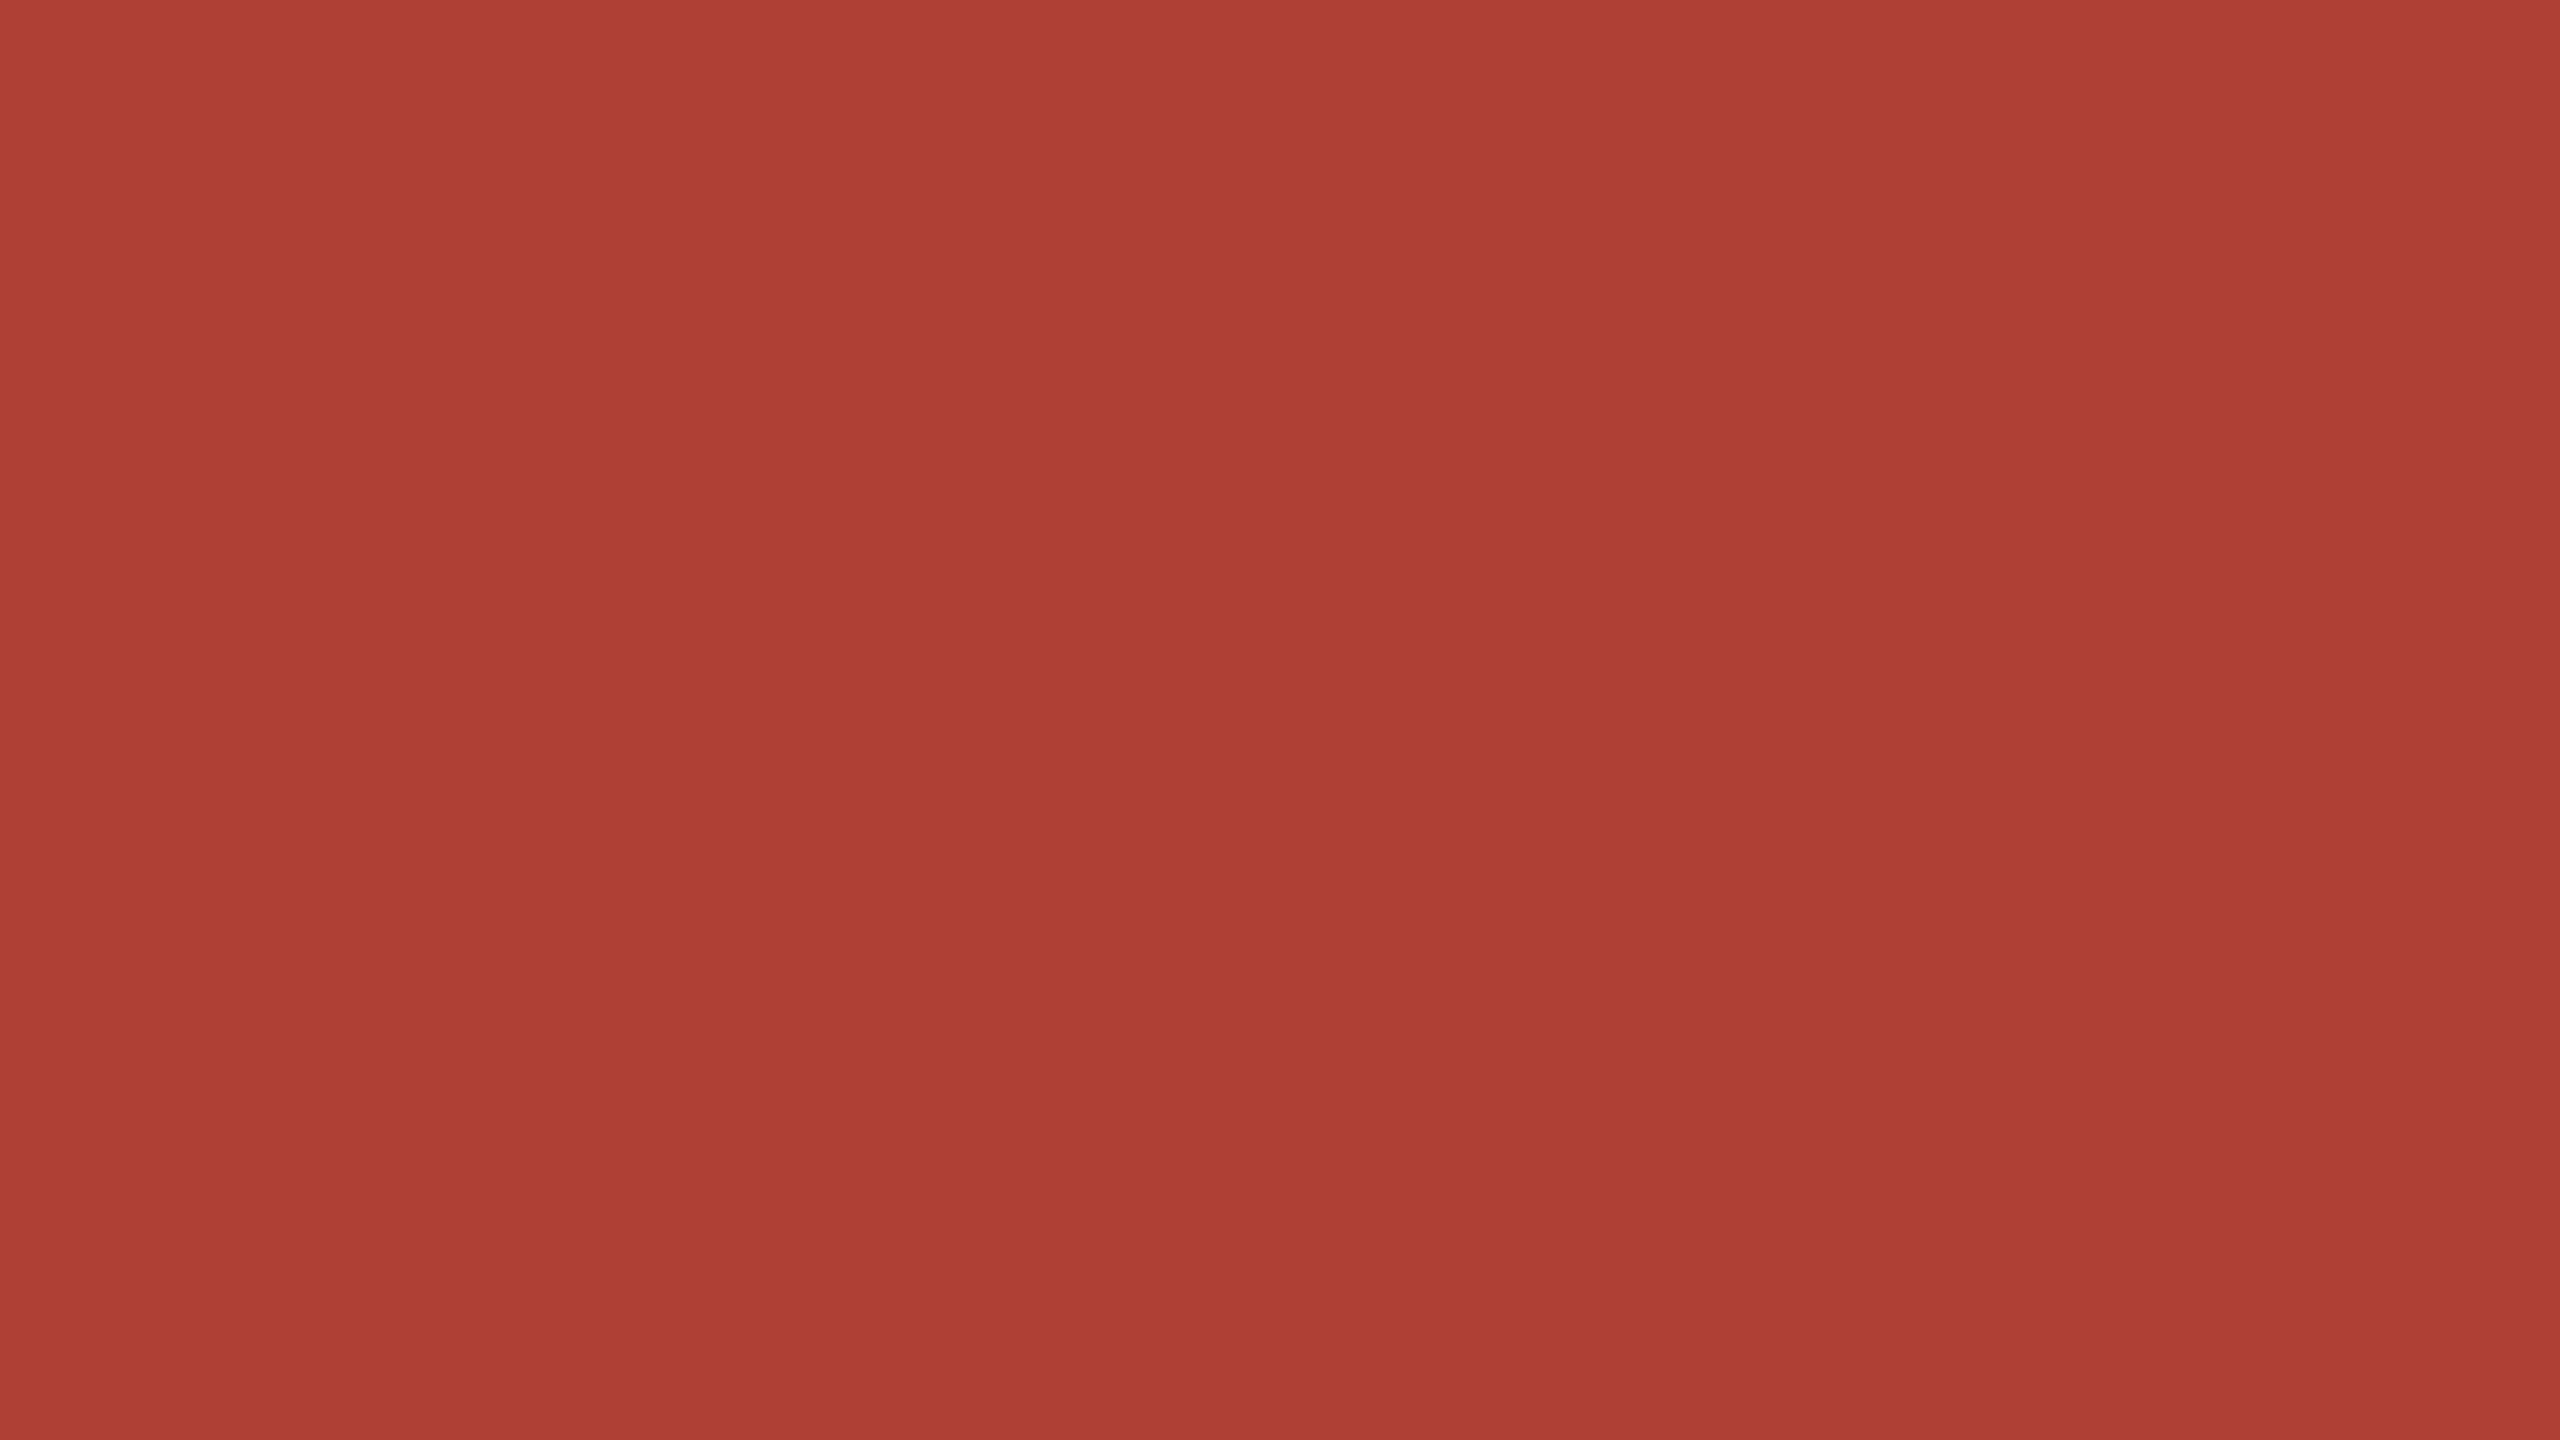 2560x1440 Pale Carmine Solid Color Background